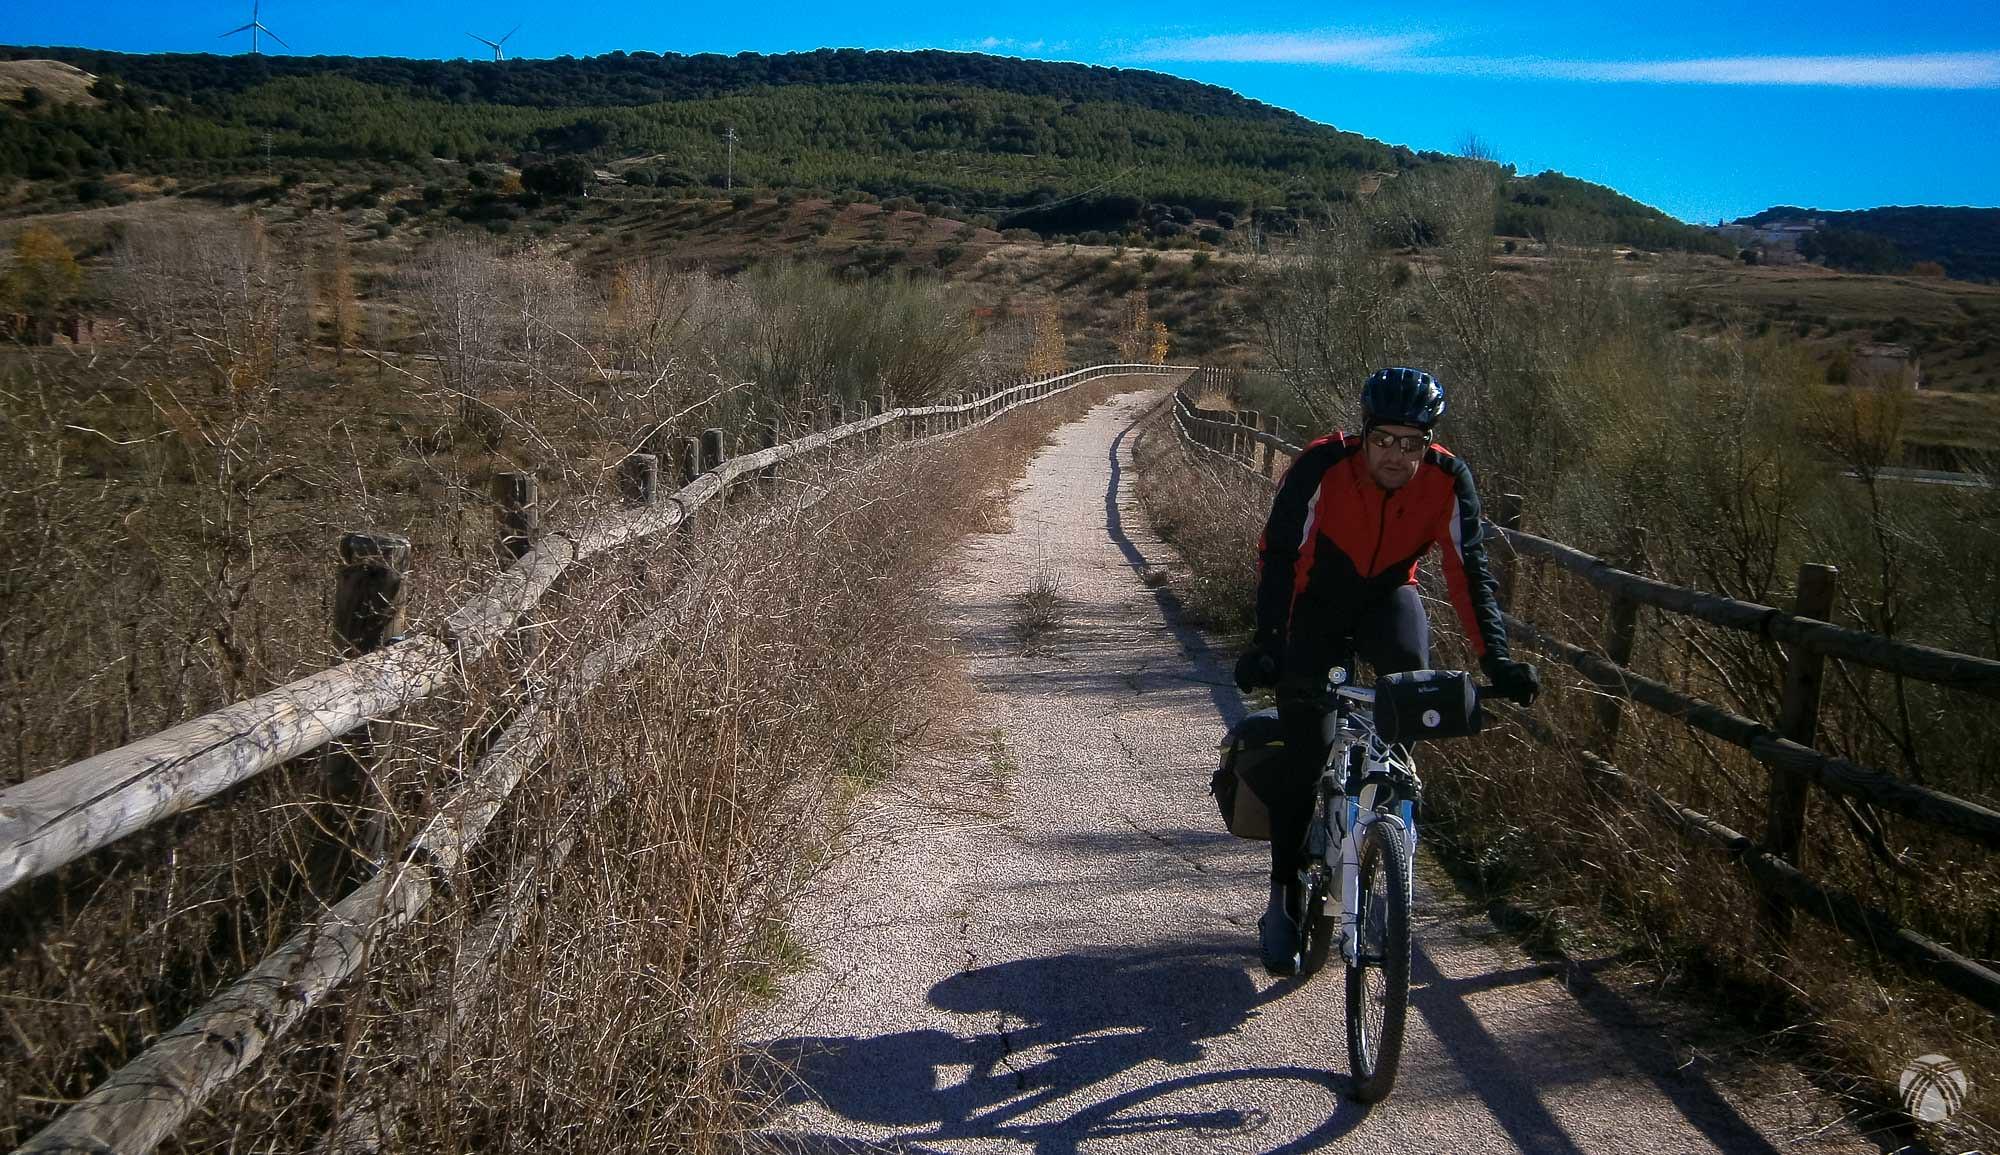 Rubén apretando pedales